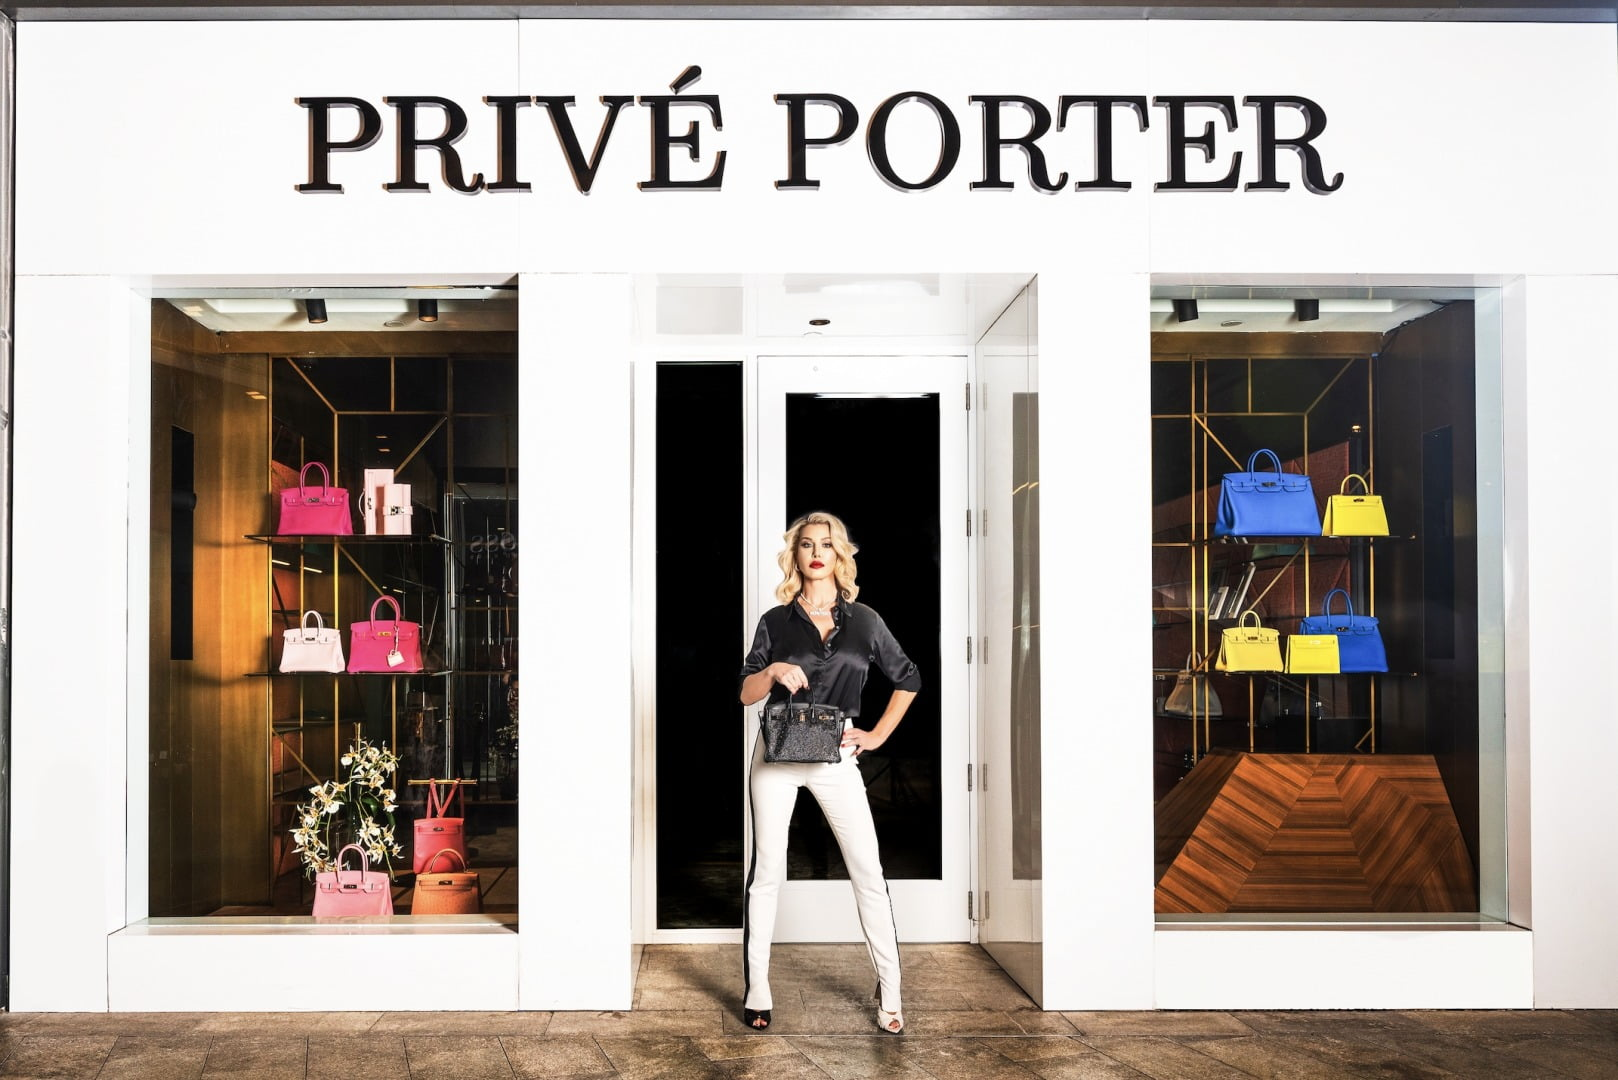 Privé Porter